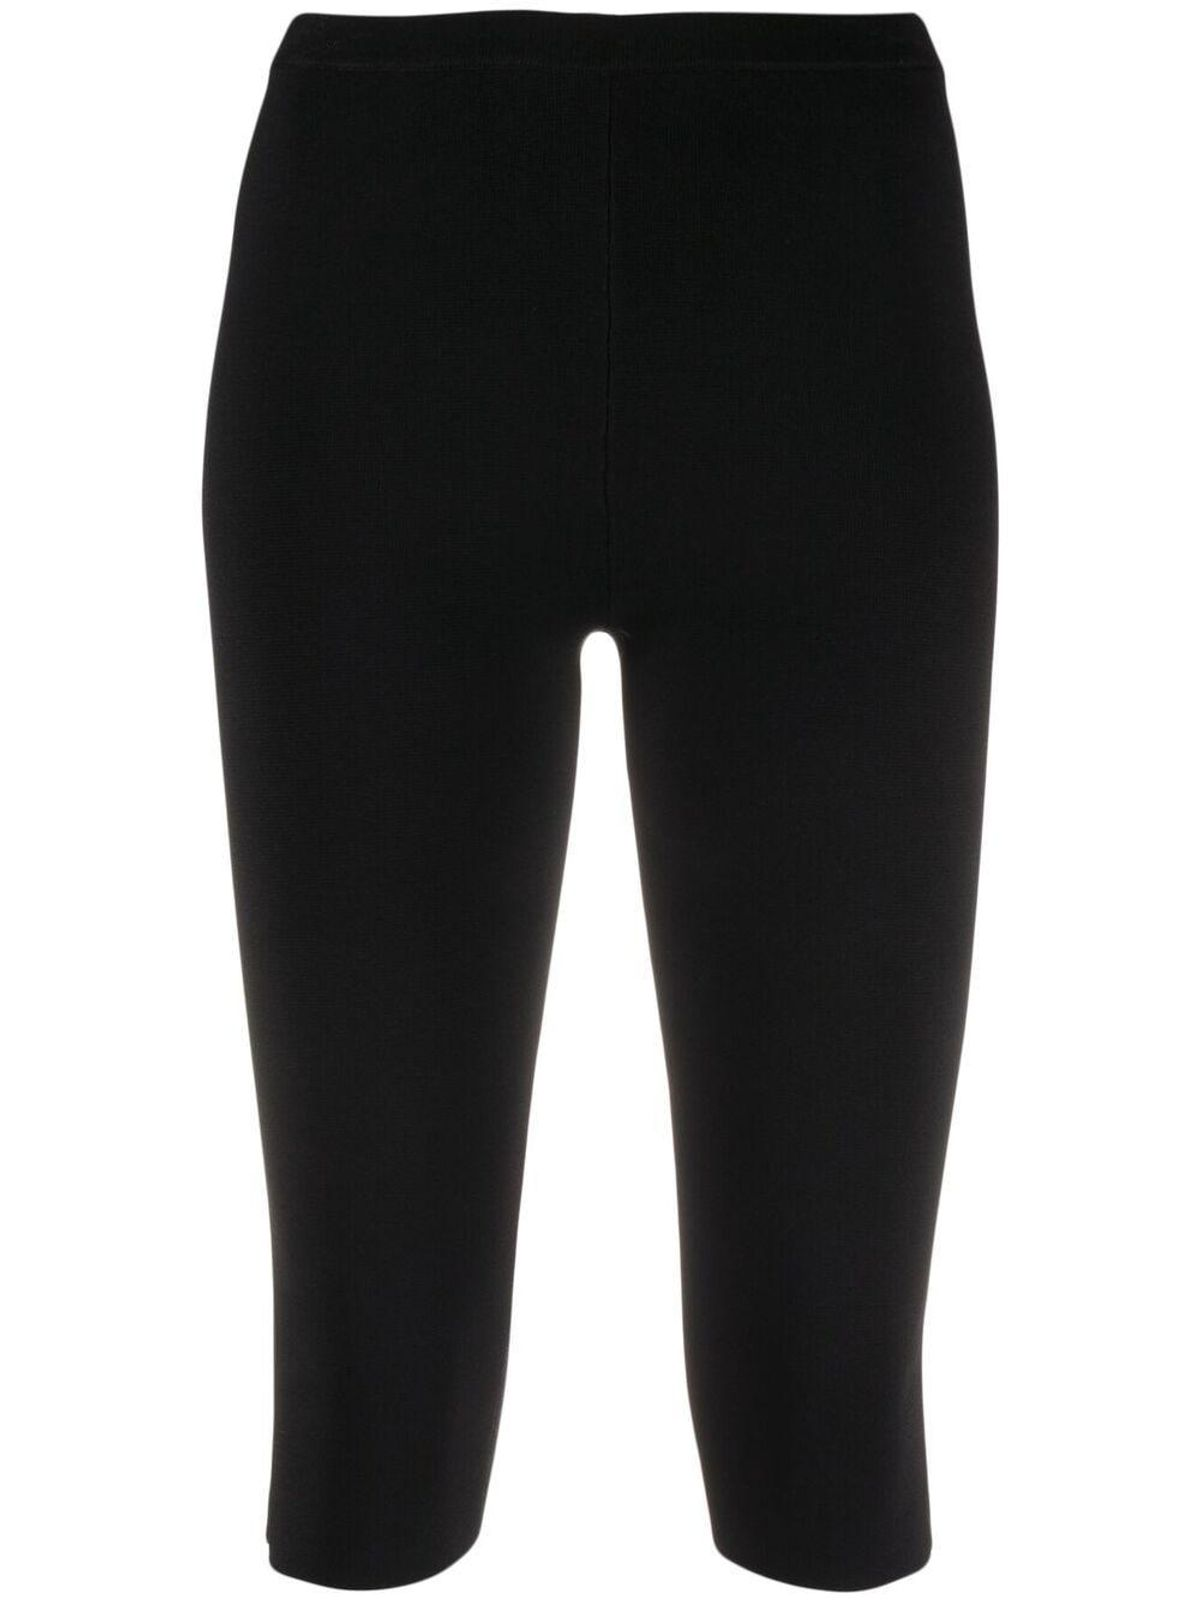 Knee Length Cycle Shorts